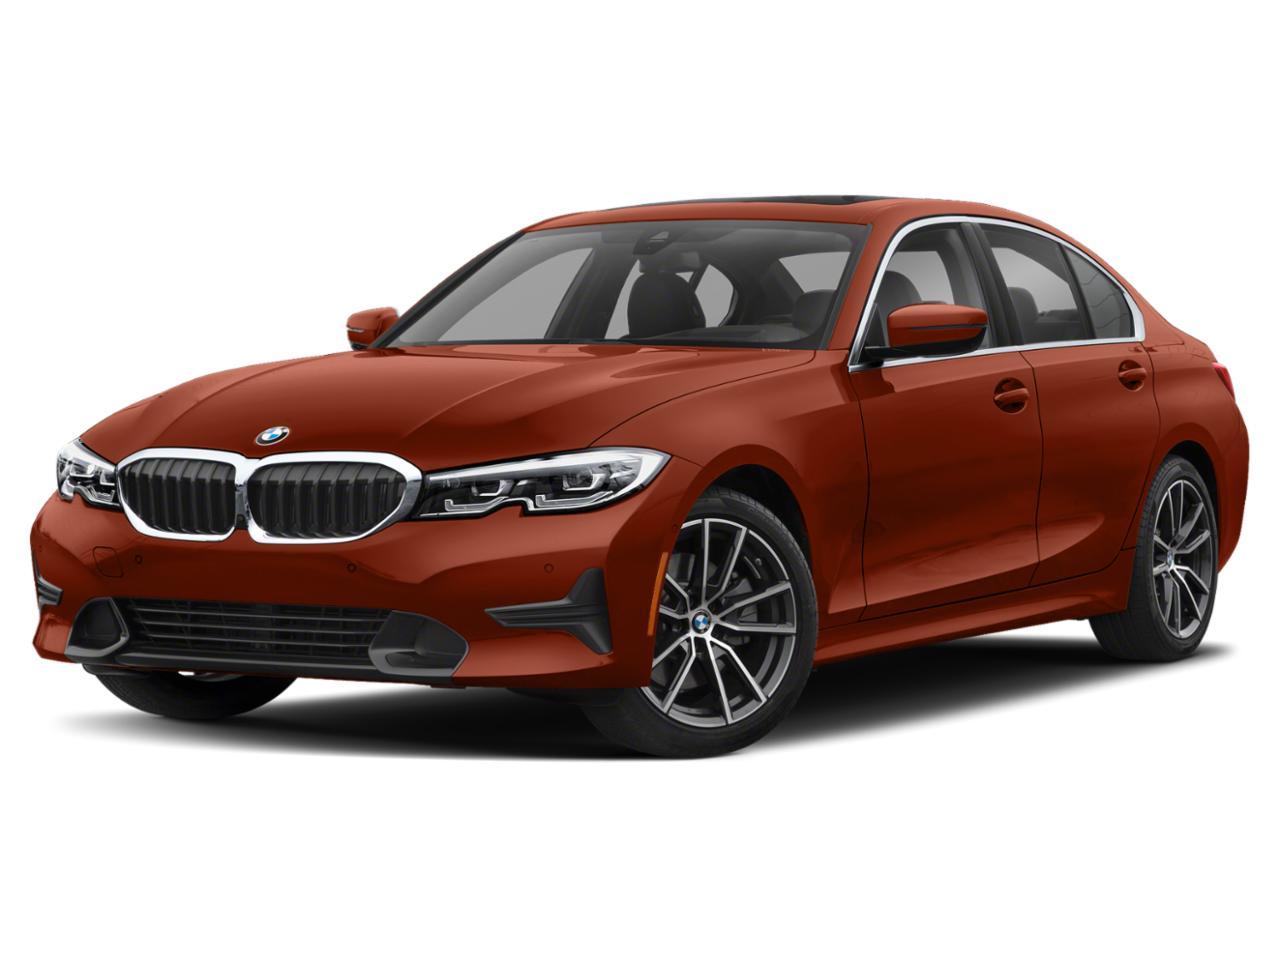 2021 BMW 330i Vehicle Photo in Pleasanton, CA 94588